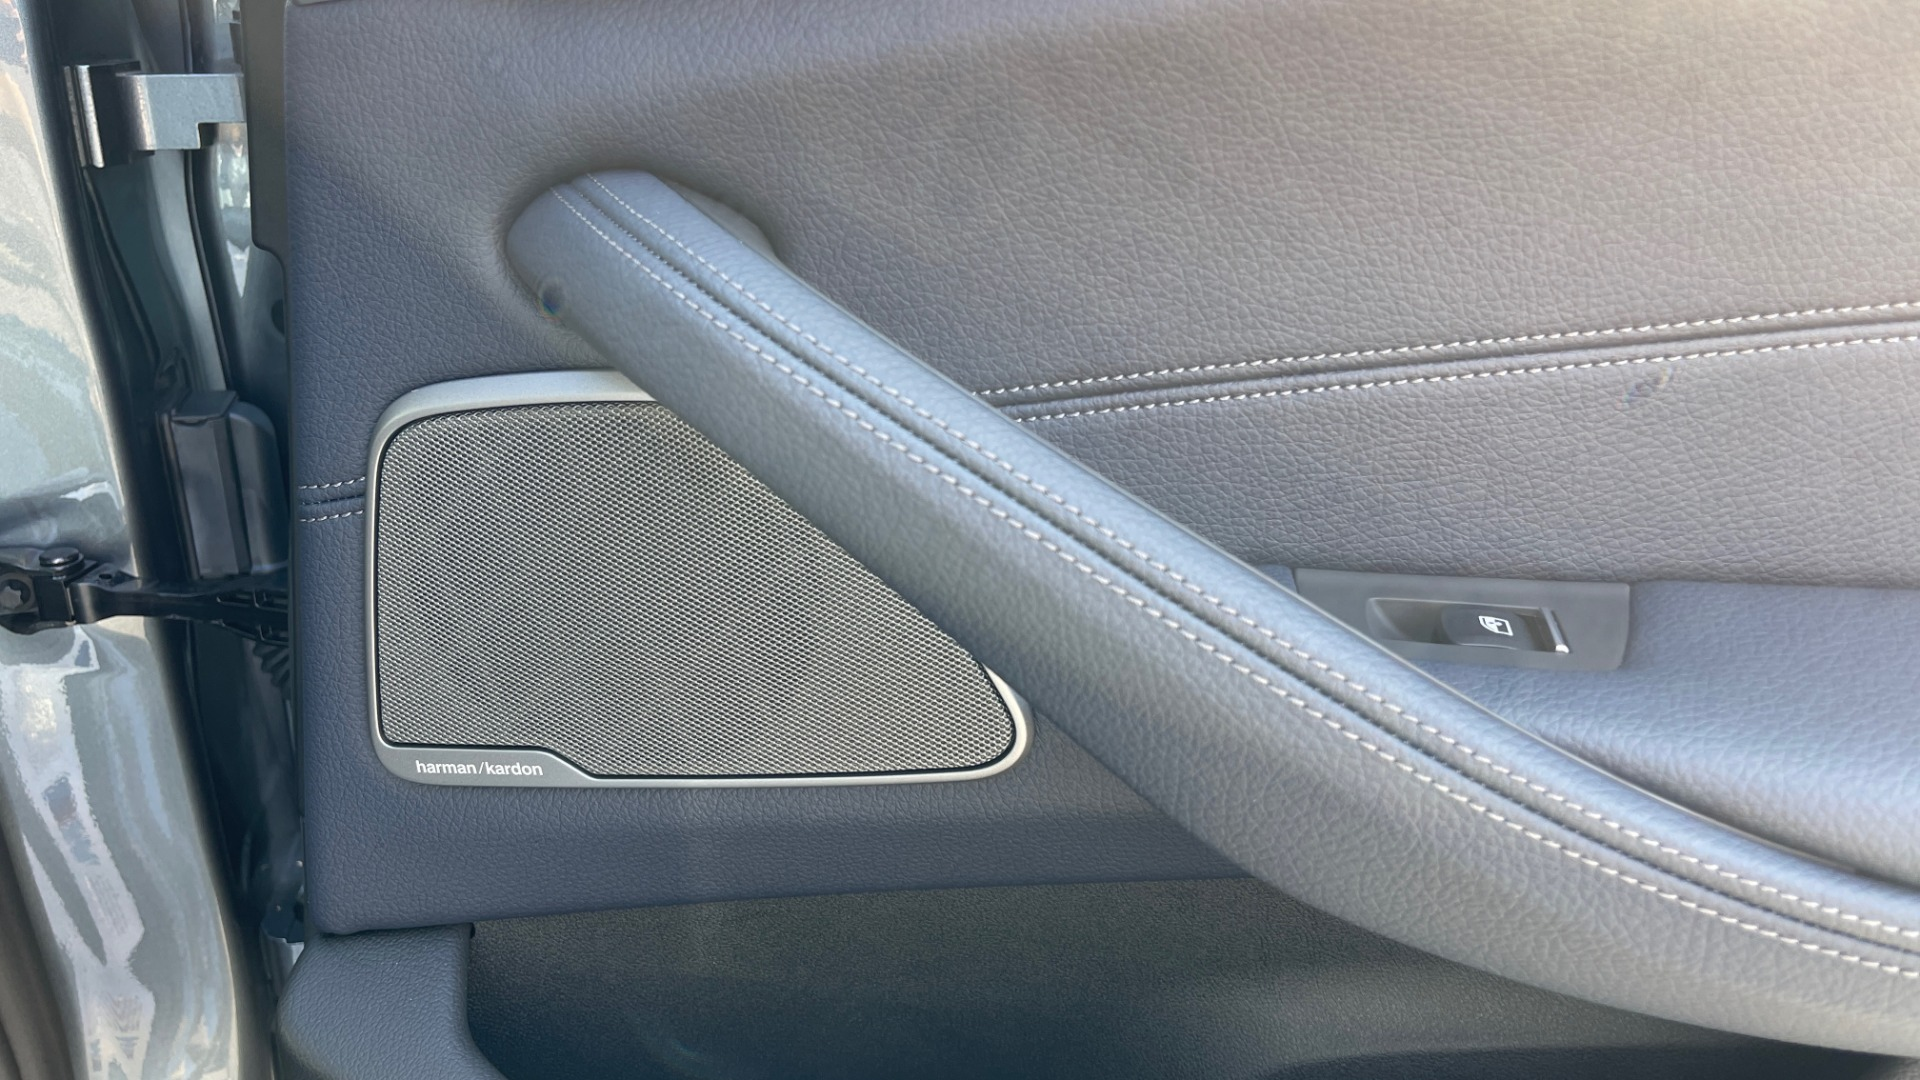 Used 2018 BMW 5 SERIES 540I XDRIVE M-SPORT / DRVR ASST / PDC / APPLE / HUD / H/K SND for sale $42,795 at Formula Imports in Charlotte NC 28227 59